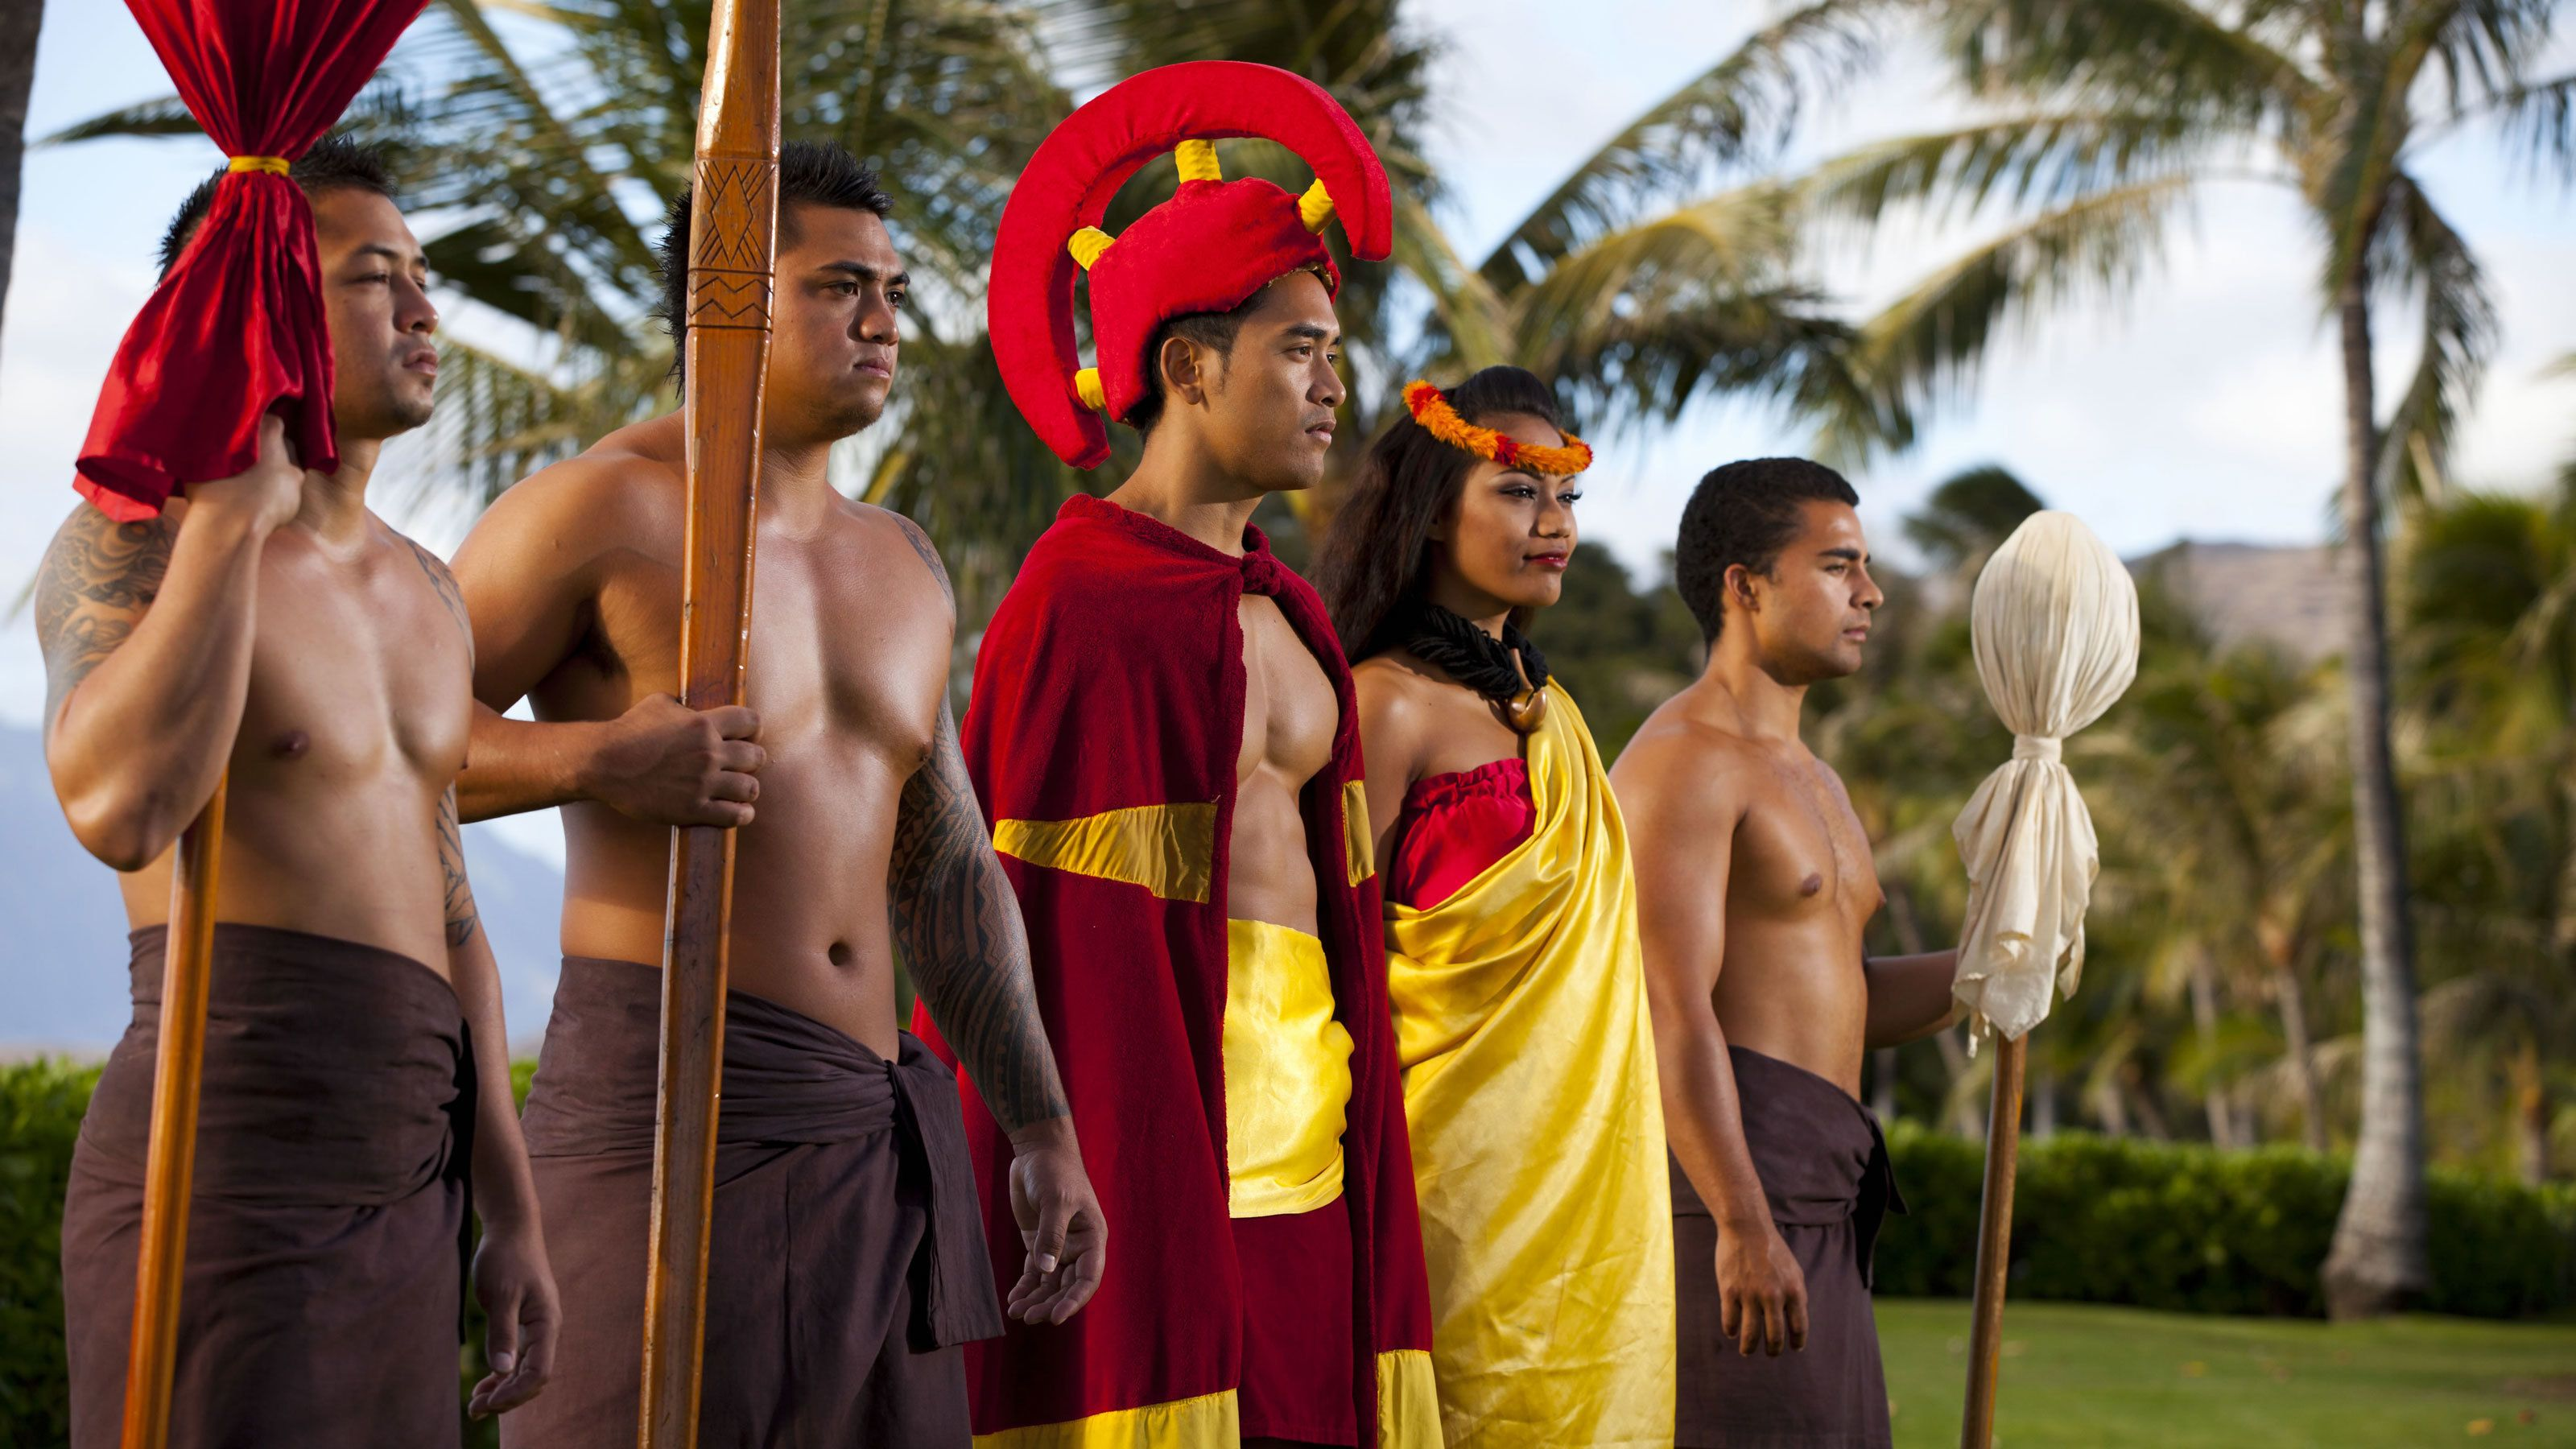 Luau performers in traditional dress in Oahu